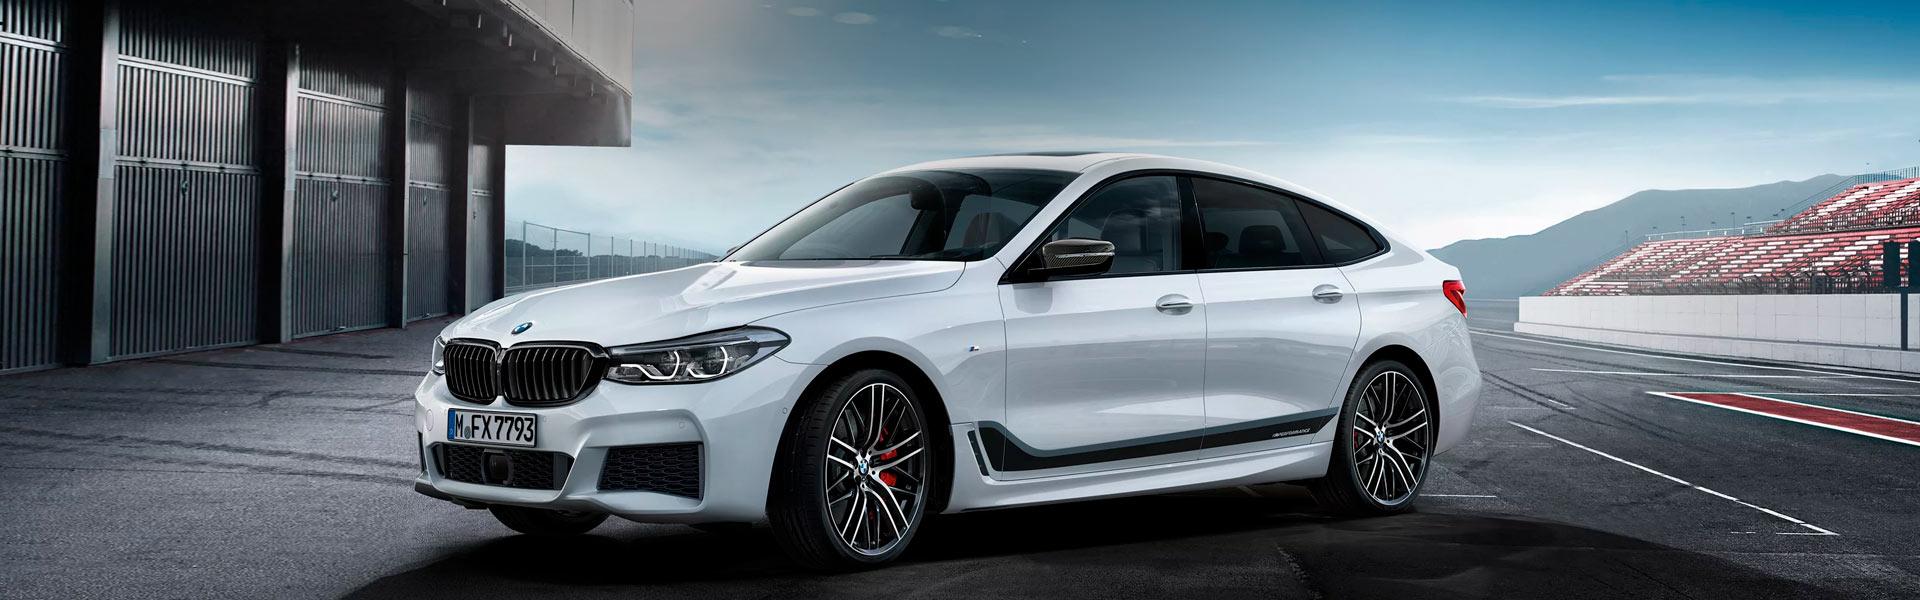 Фильтр АКПП на BMW 6-series